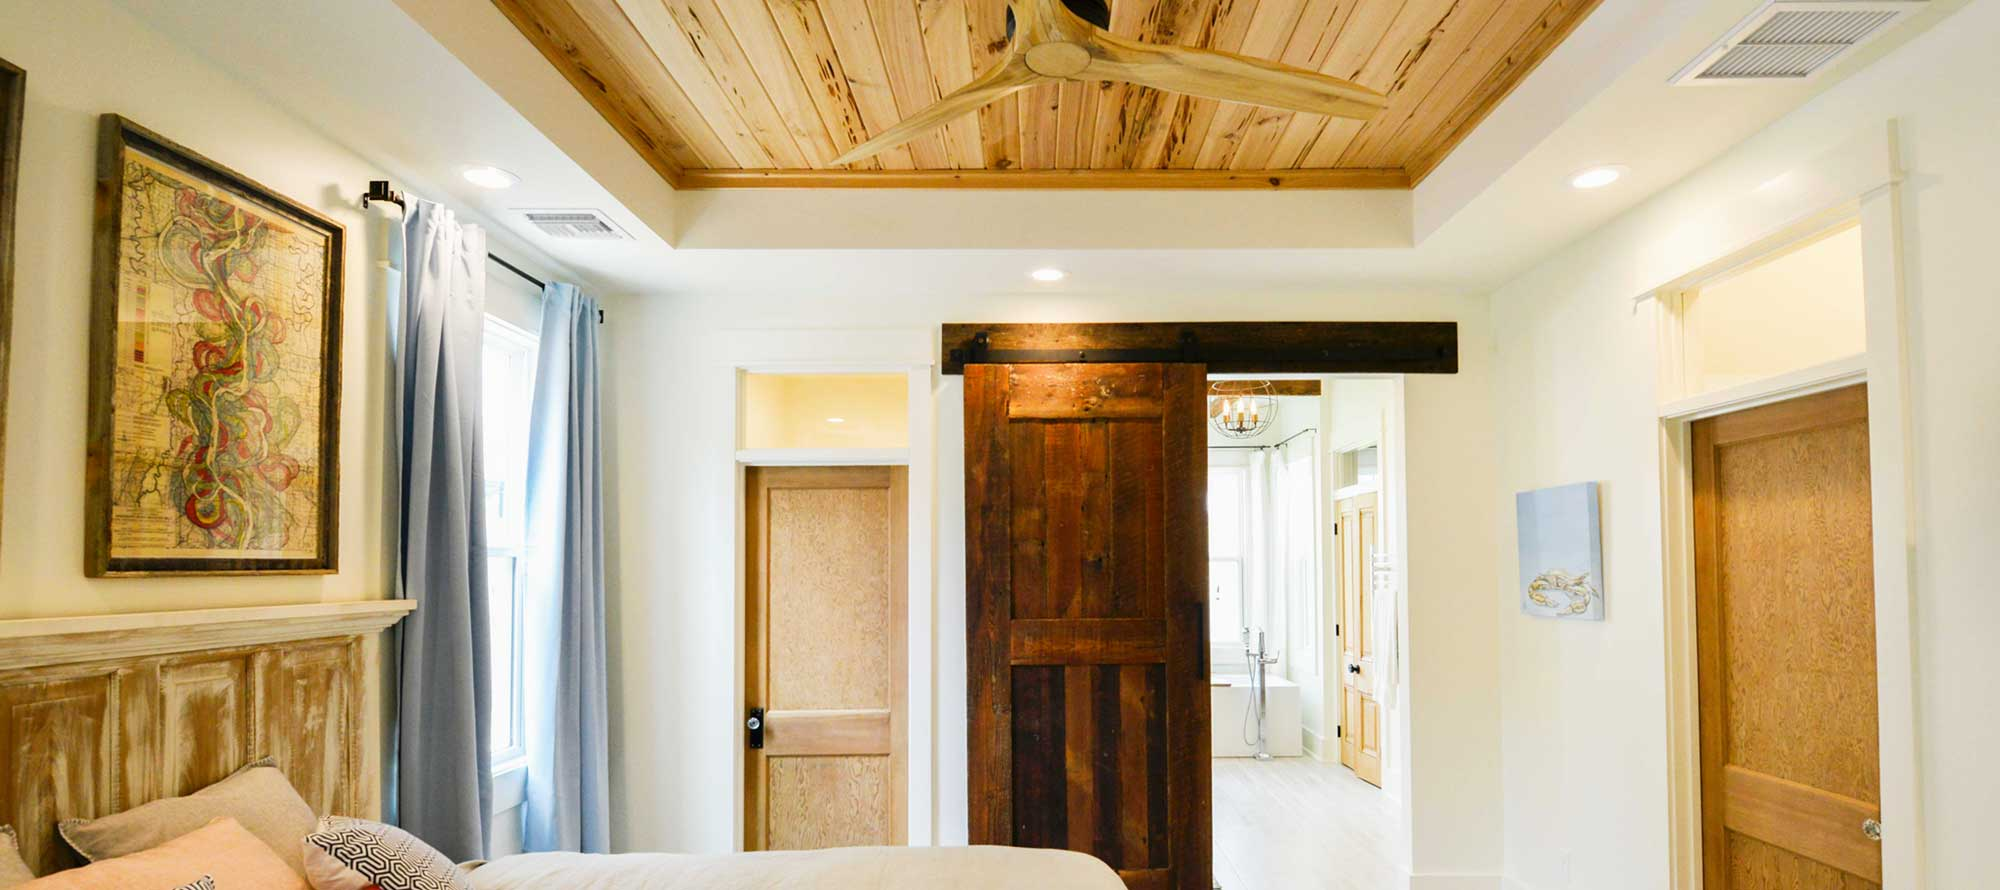 Bath and Bedroom Renovations